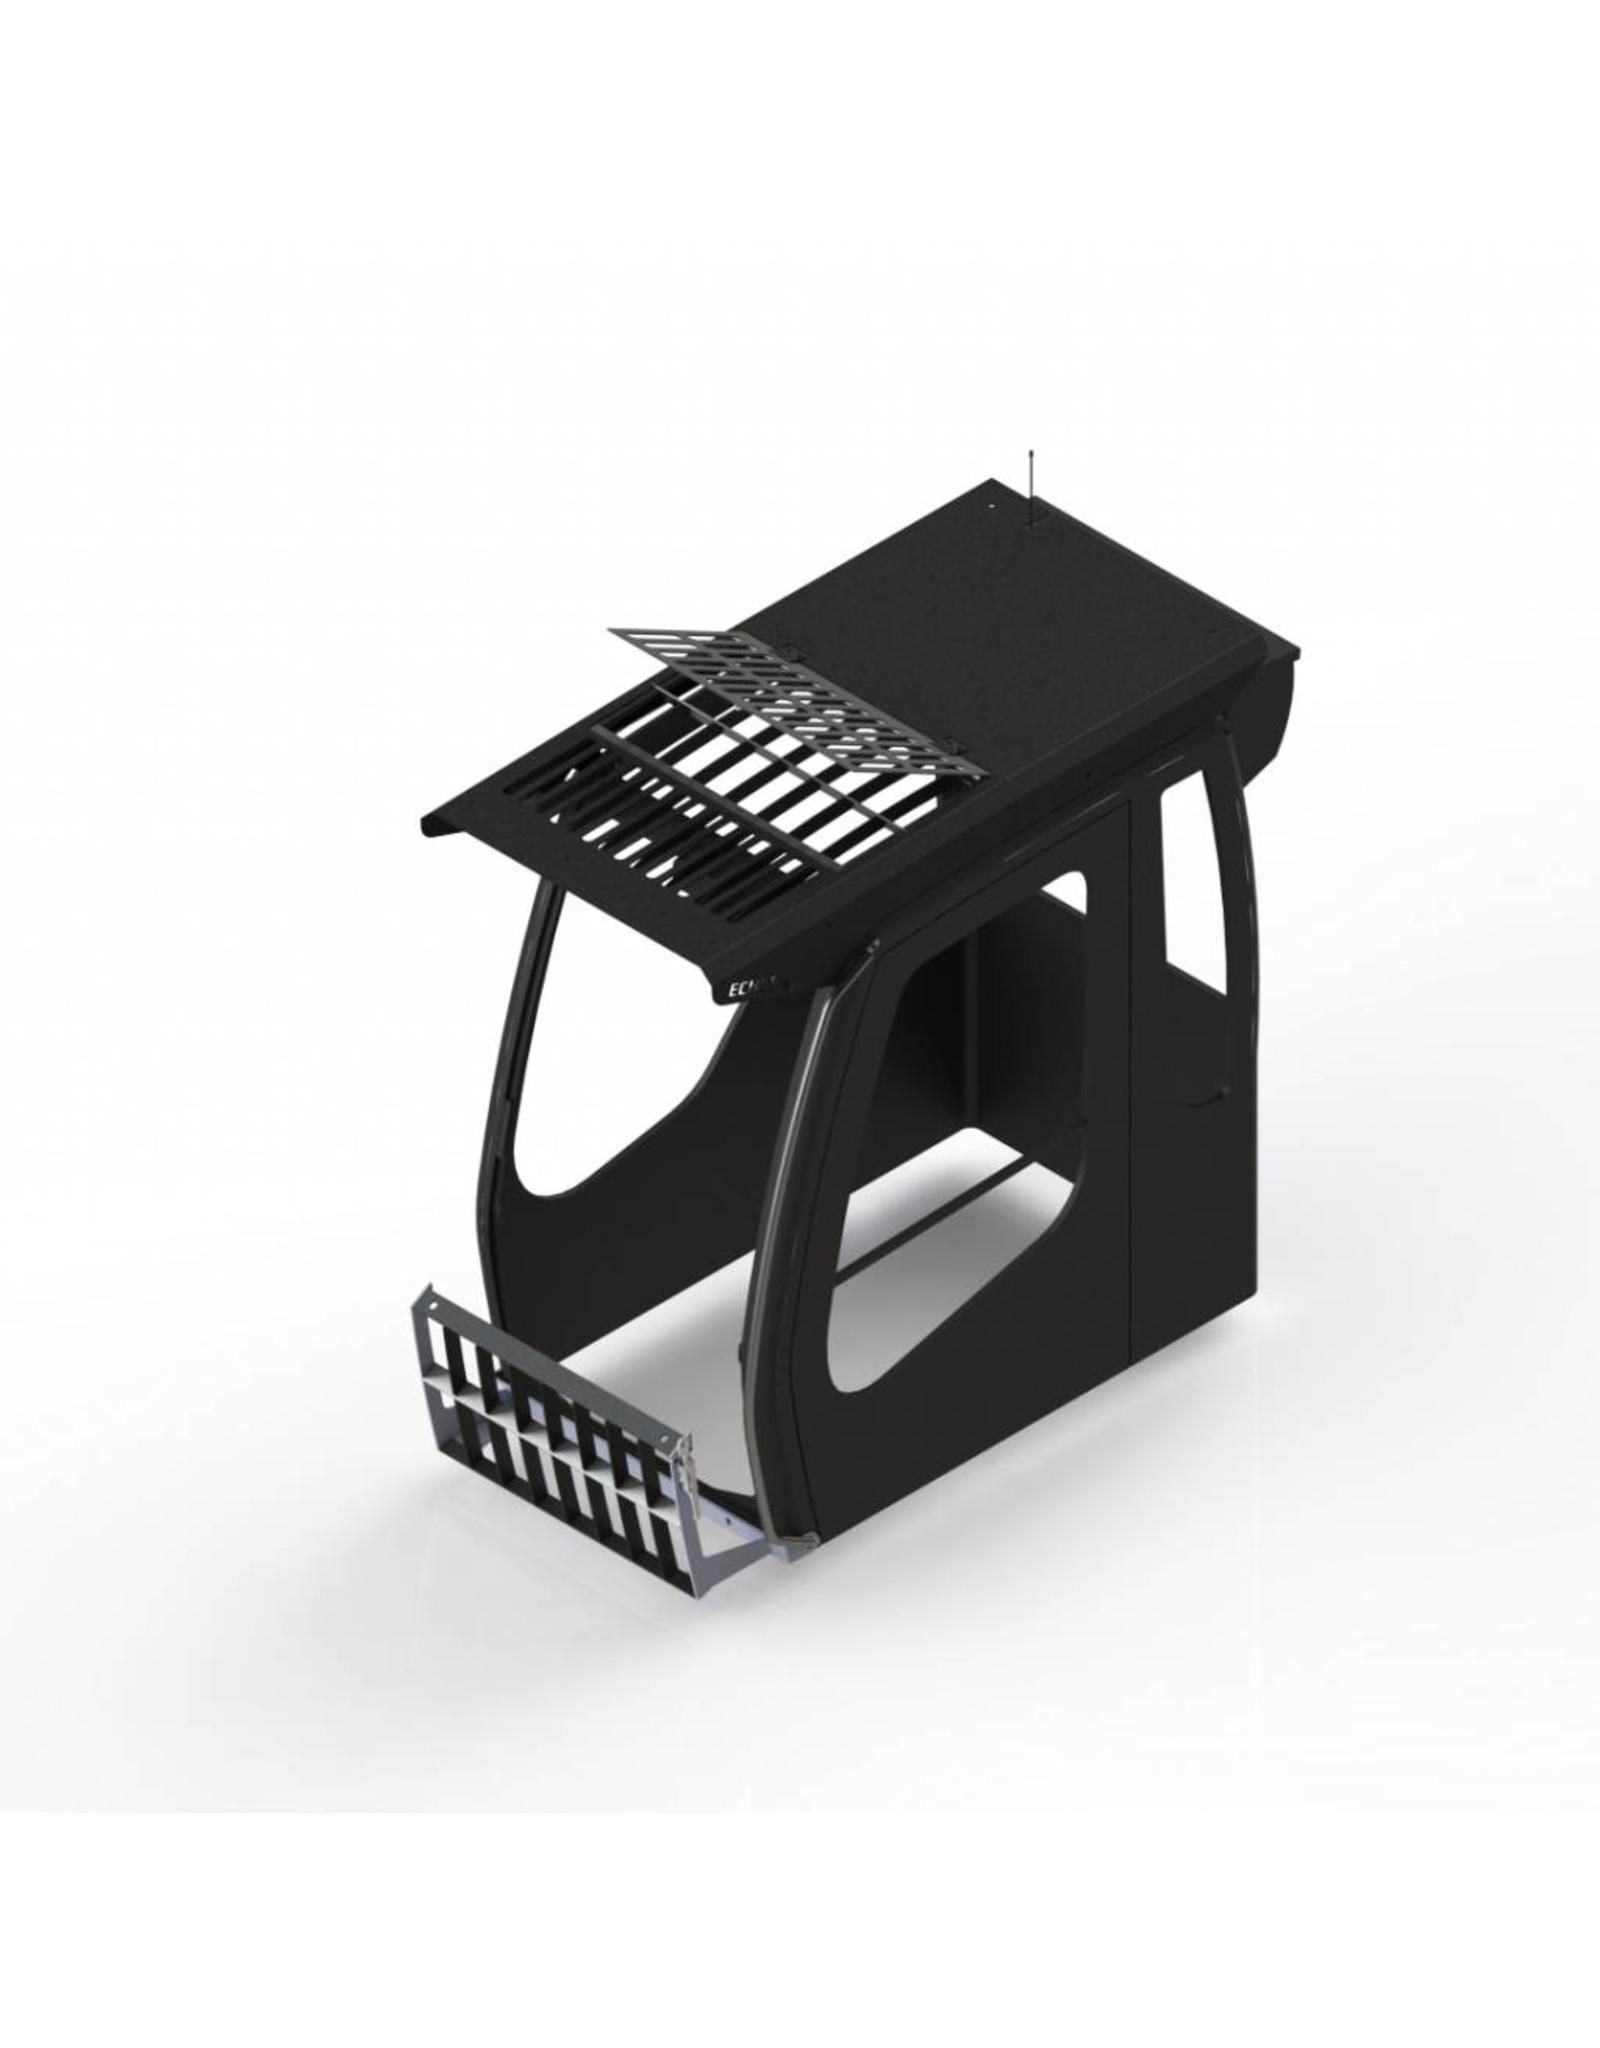 Echle Hartstahl GmbH FOPS pour Liebherr R 956